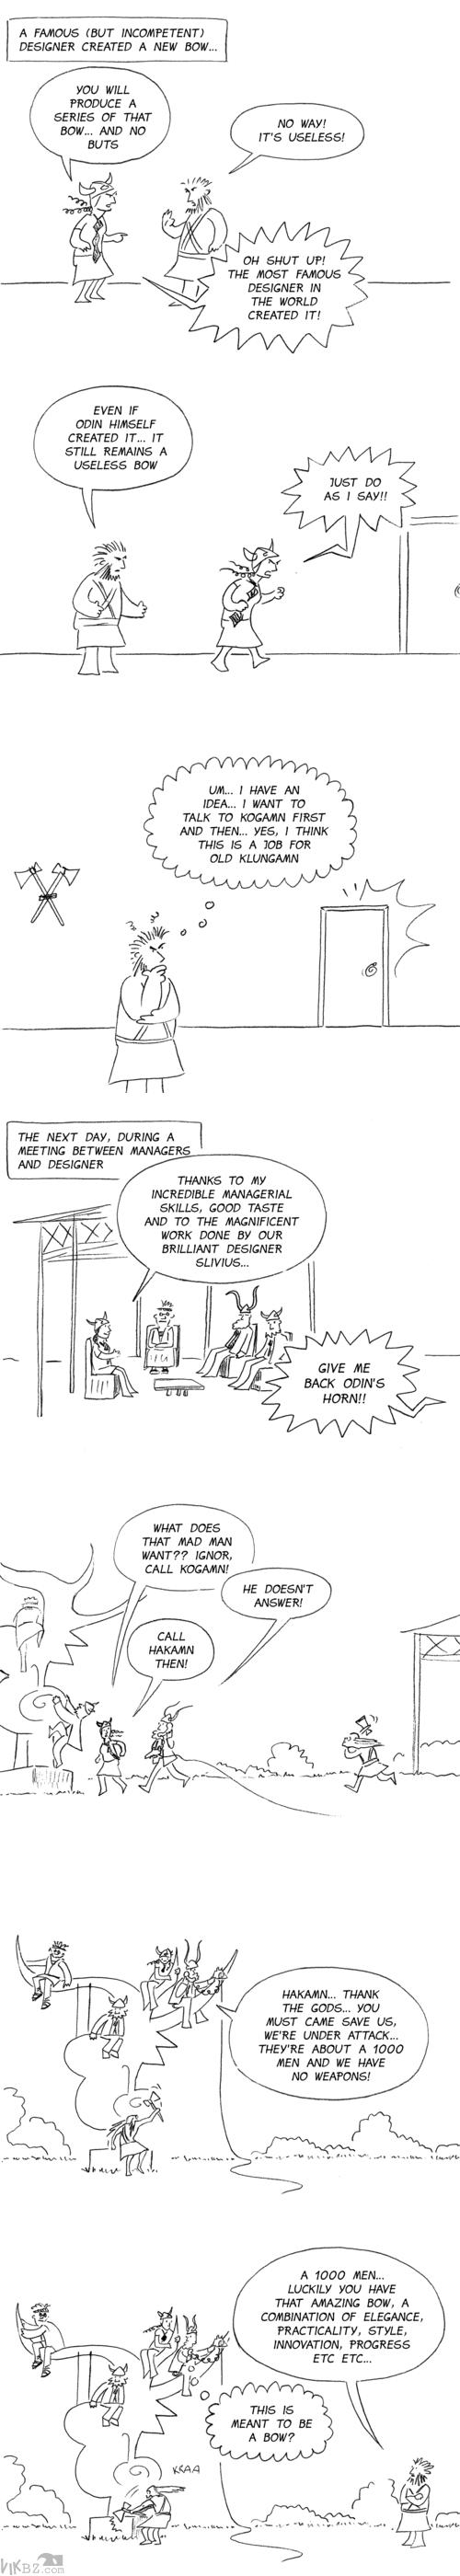 Arcus's revenge